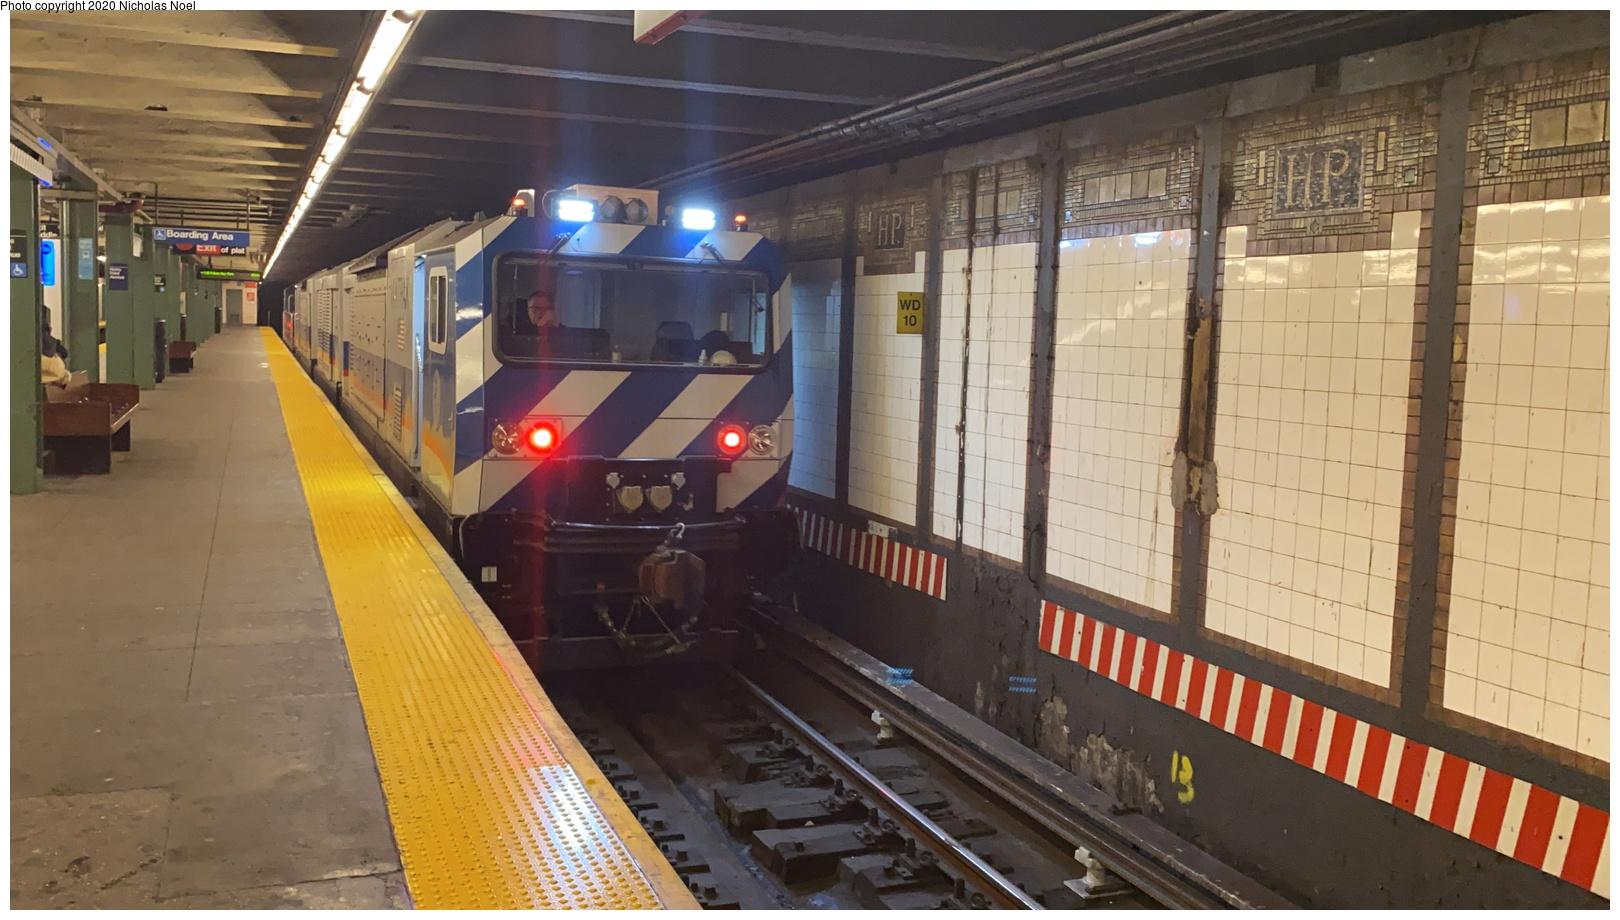 (483k, 1620x920)<br><b>Country:</b> United States<br><b>City:</b> New York<br><b>System:</b> New York City Transit<br><b>Line:</b> IRT Pelham Line<br><b>Location:</b> Hunts Point Avenue <br><b>Route:</b> Work Service<br><b>Car:</b> VakTrak Vacuum Train  VT501 <br><b>Photo by:</b> Nicholas Noel<br><b>Date:</b> 1/28/2020<br><b>Viewed (this week/total):</b> 12 / 40